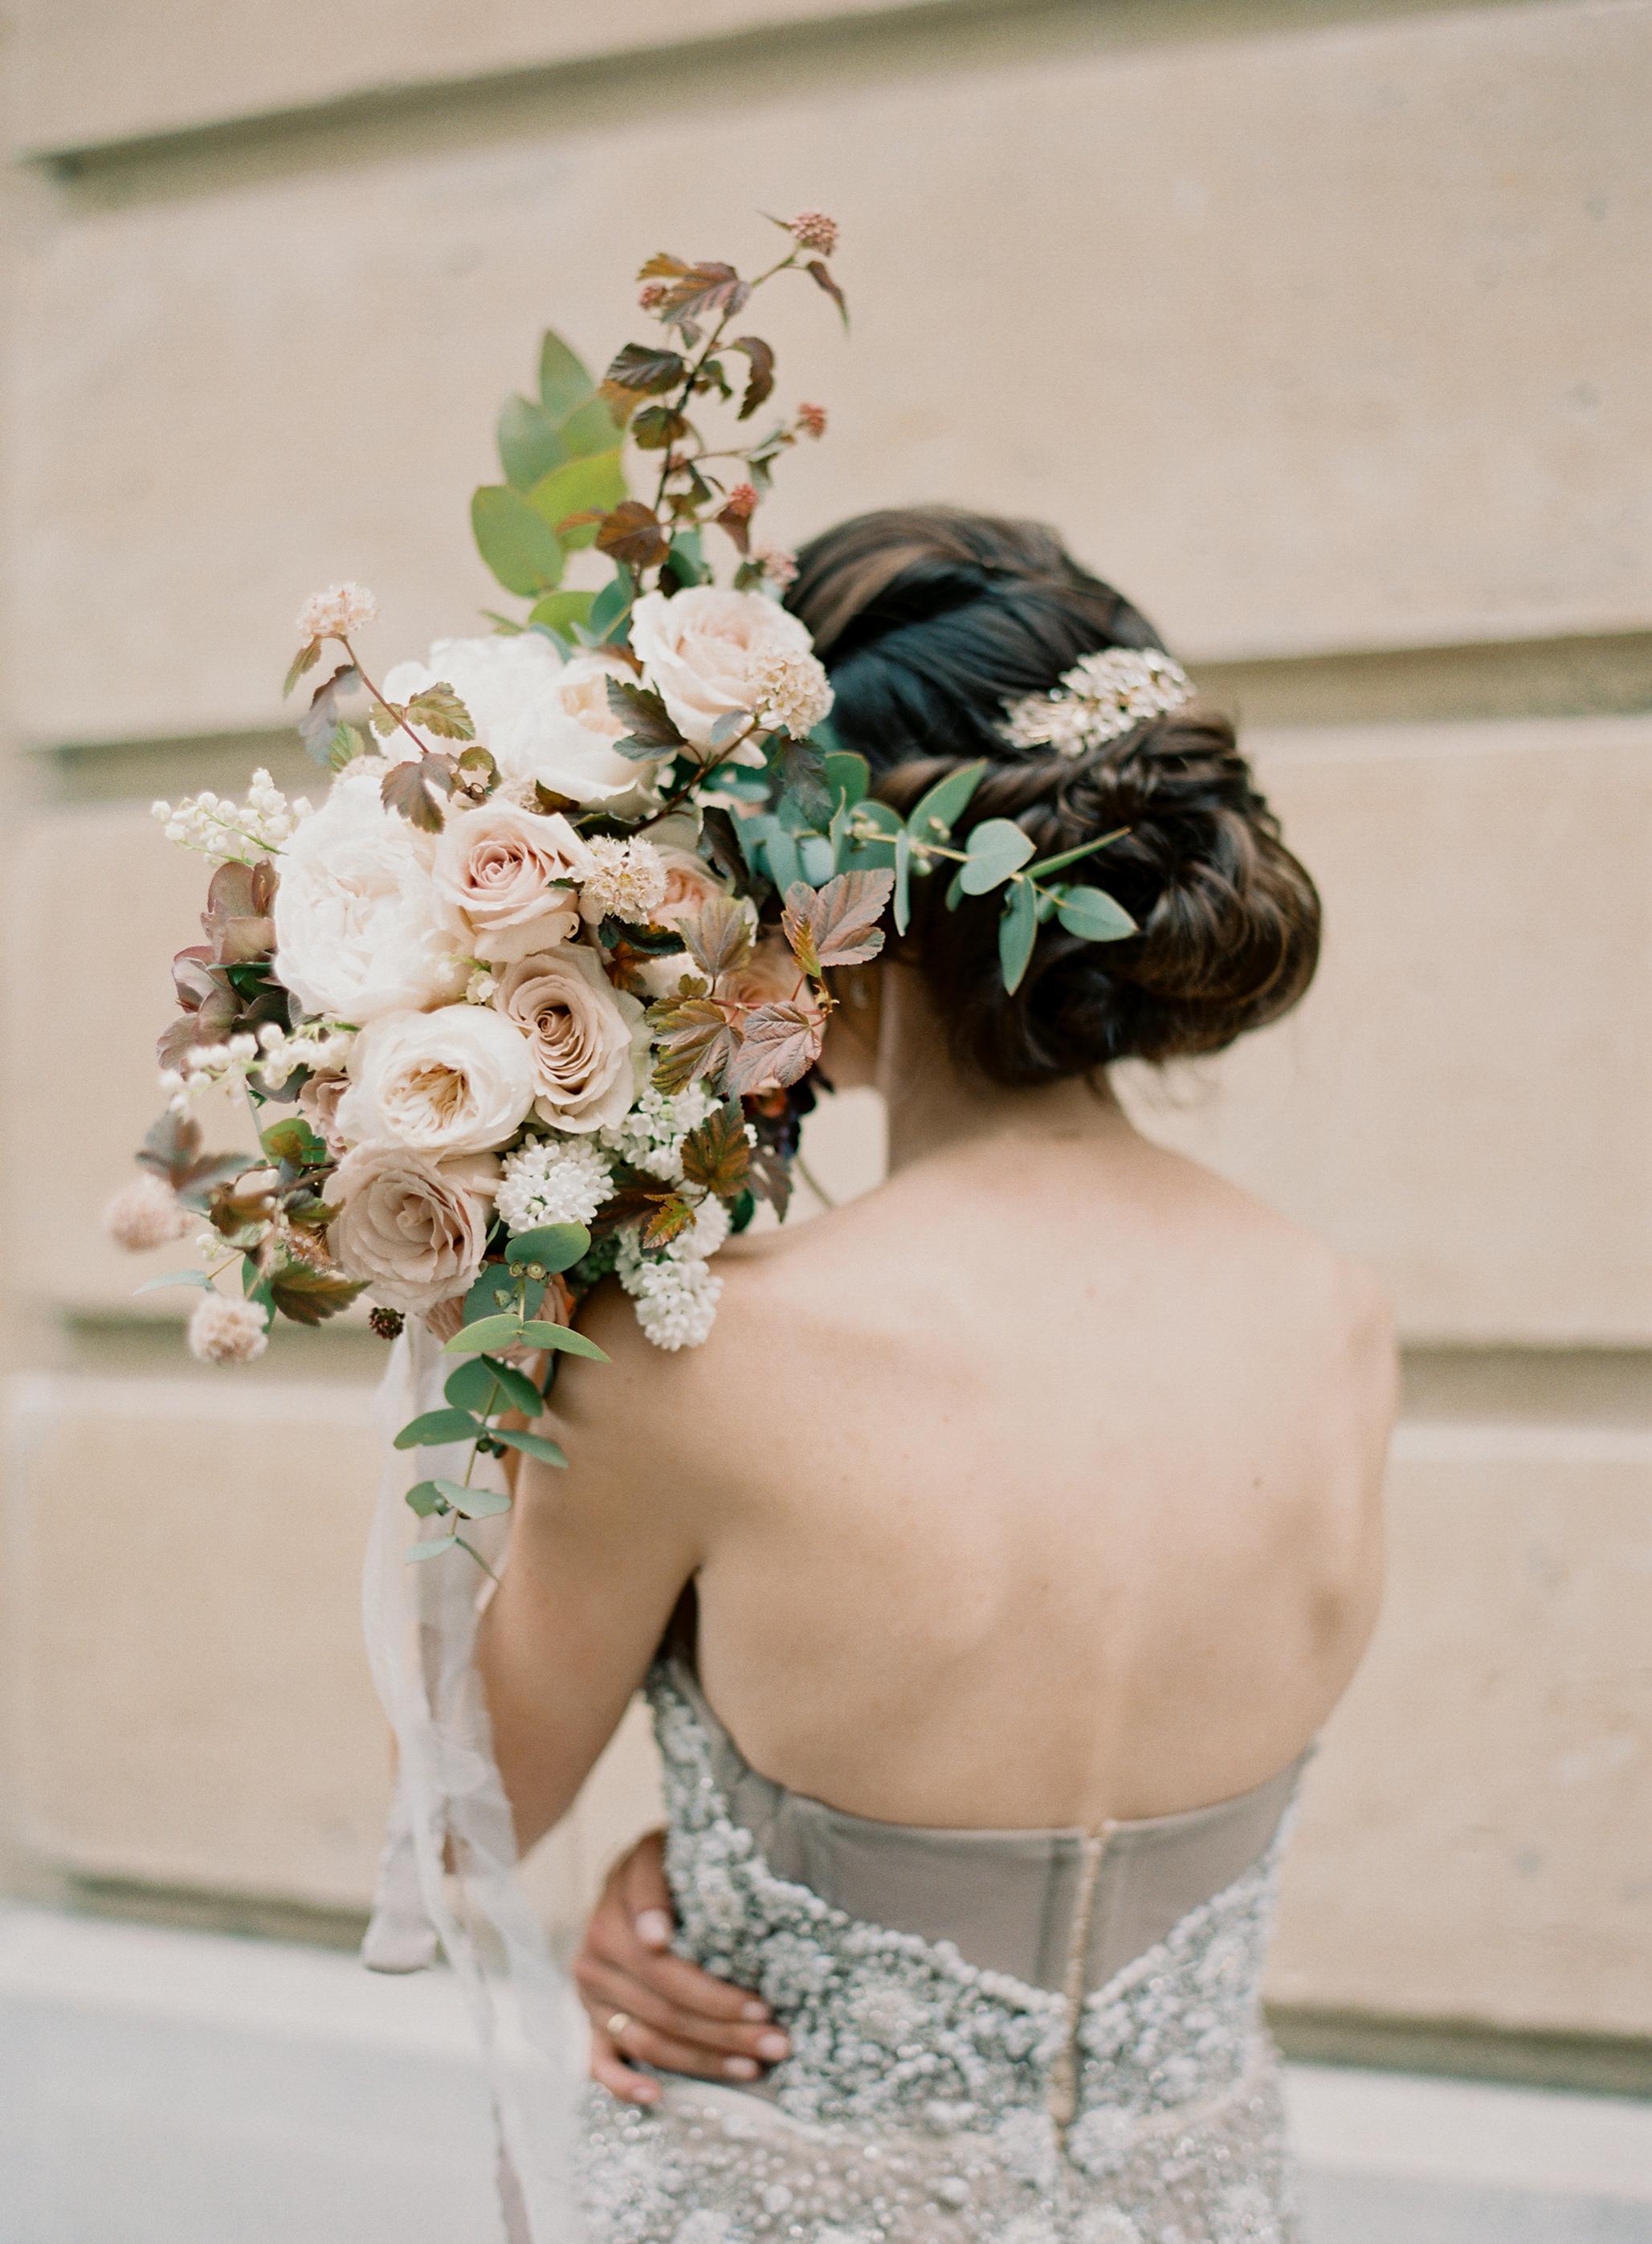 Paris-France-Film-Wedding-Carrie King Photographer-99.jpg